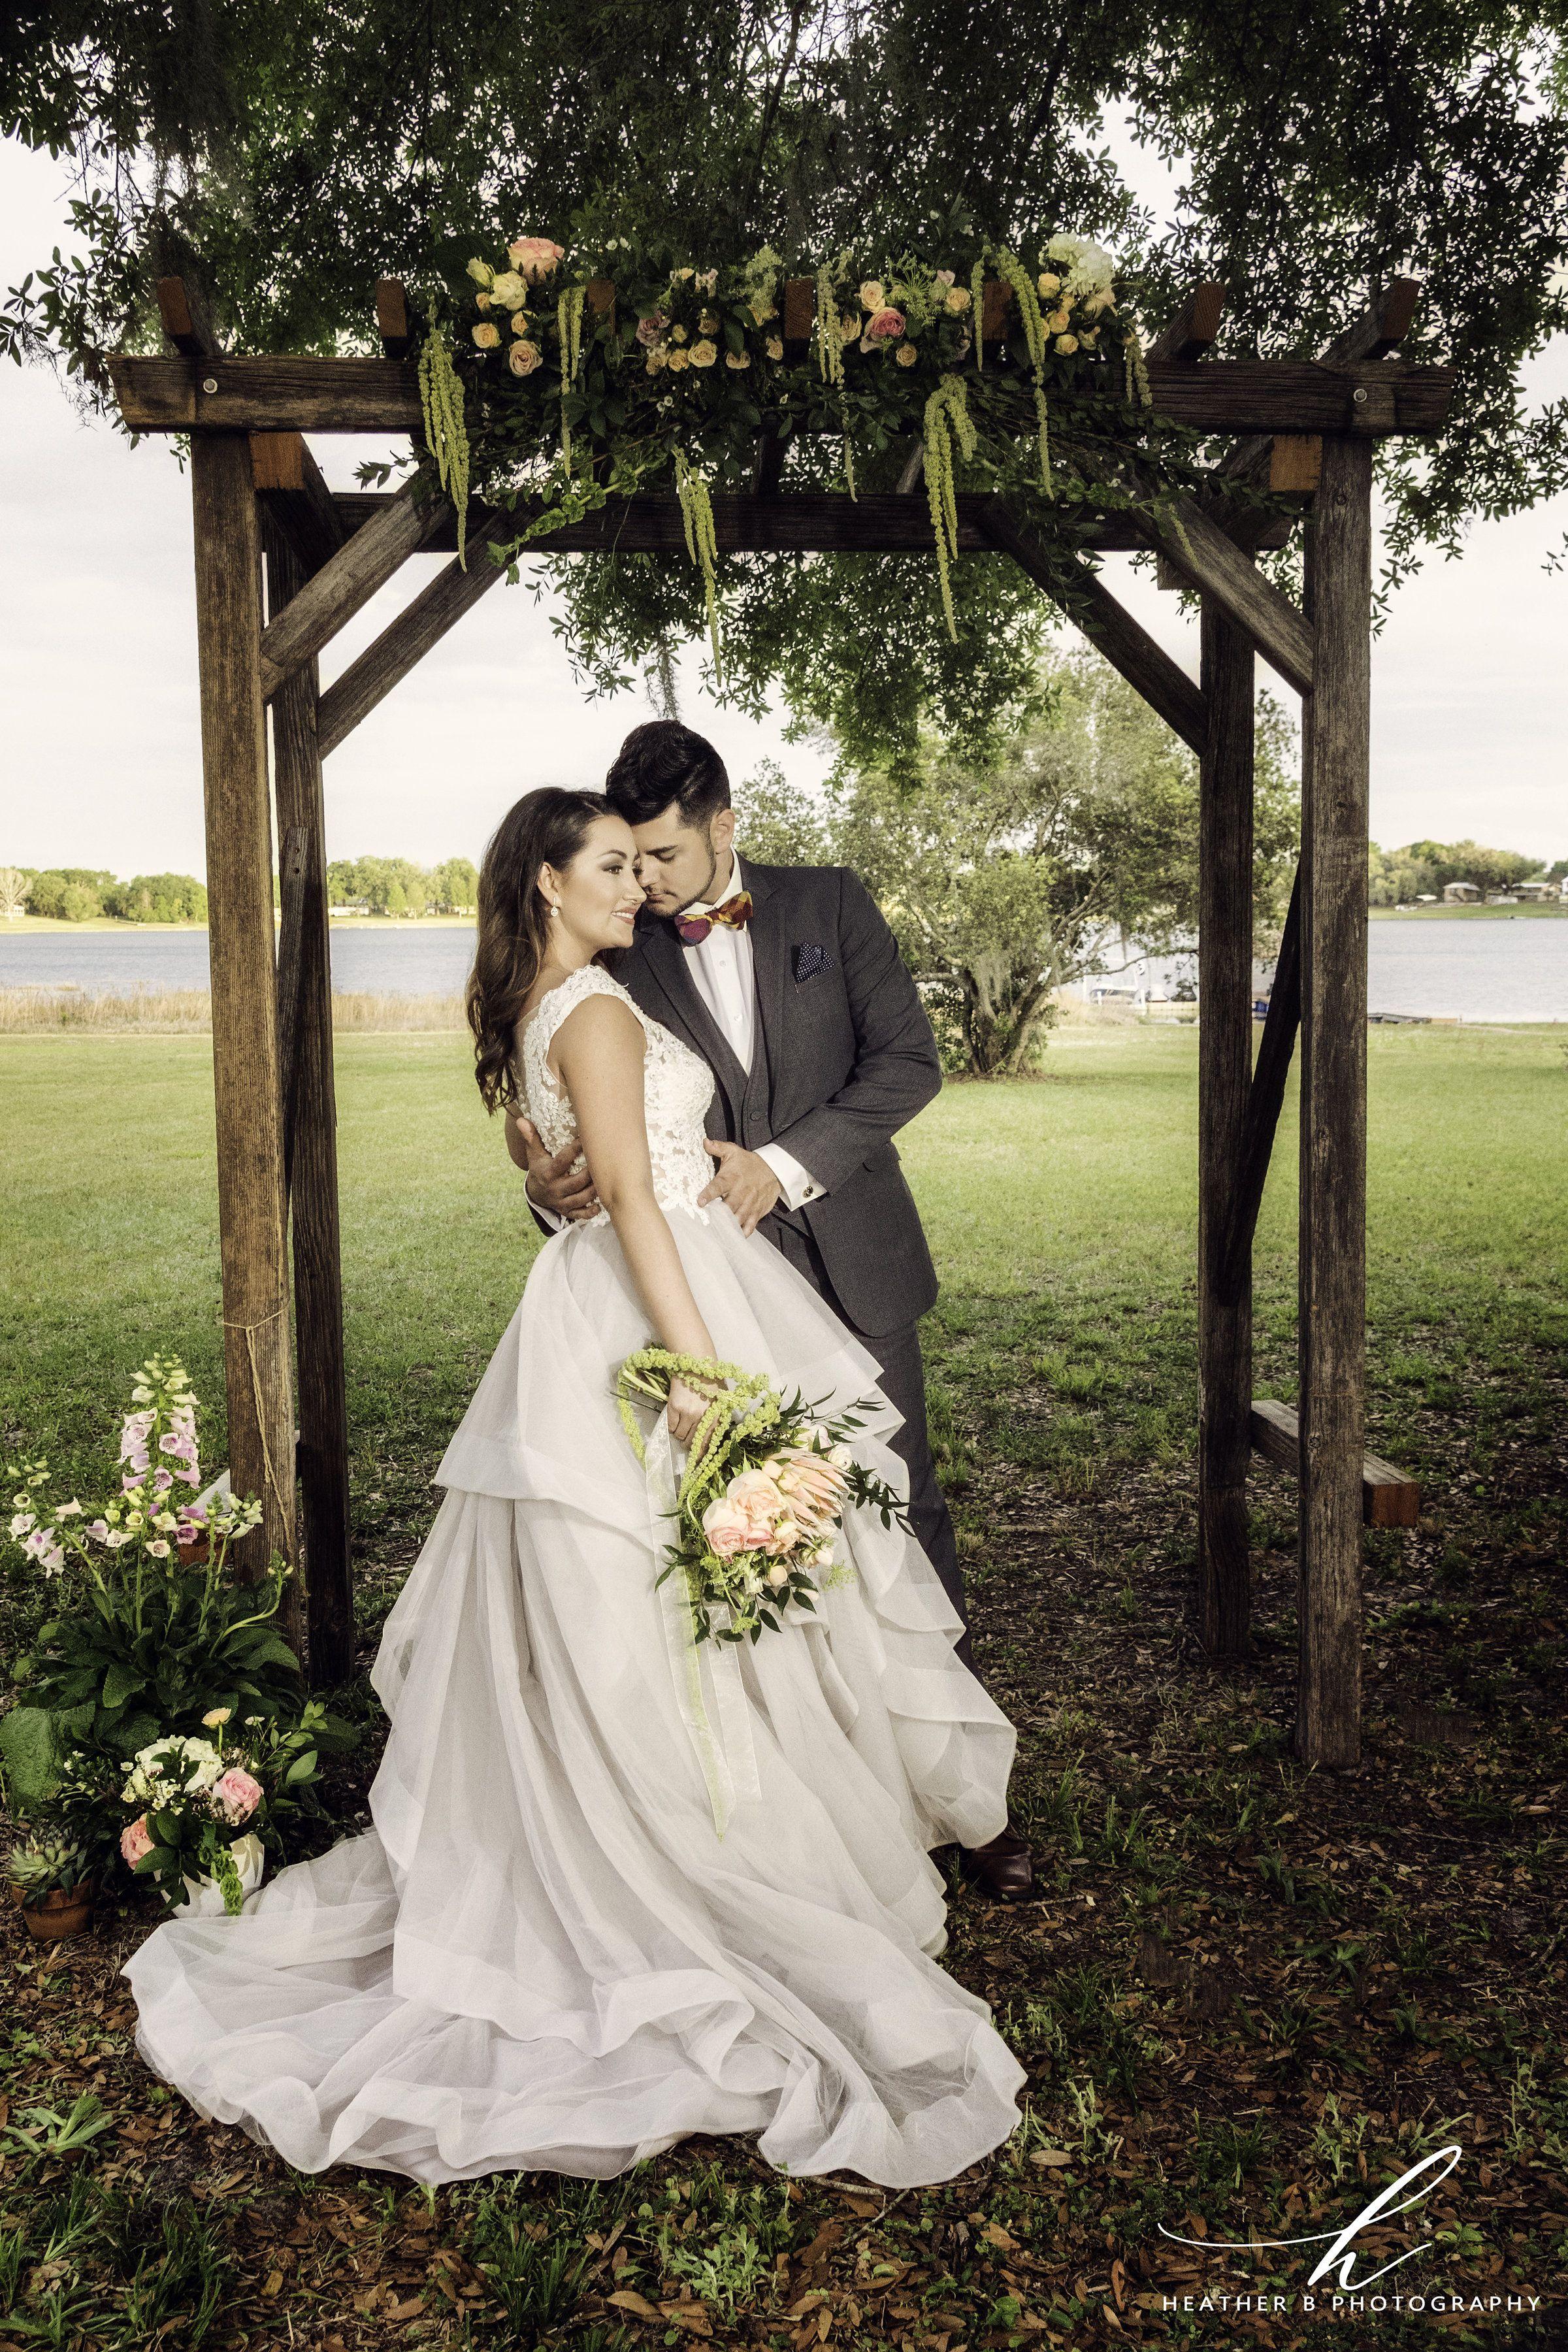 2 Tones Color Dress Fancy Frocks Bridal Gowns Bridesmaid Dresses